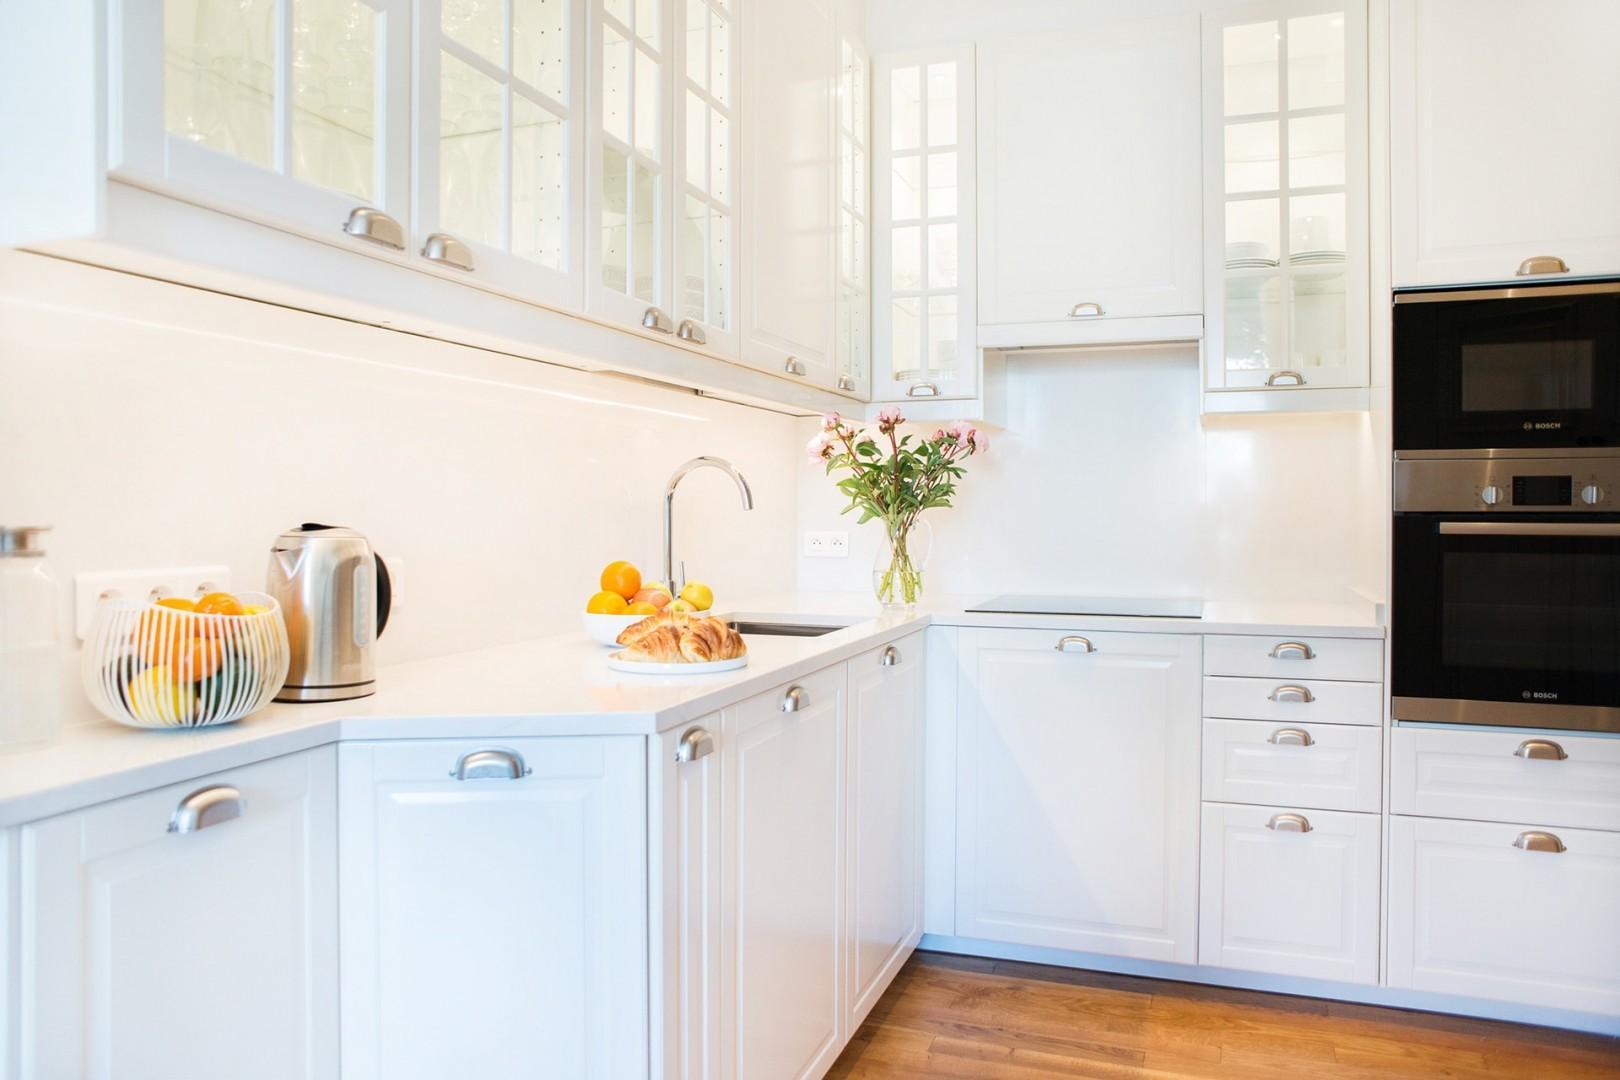 Have fun preparing meals in the open-plan modern kitchen.